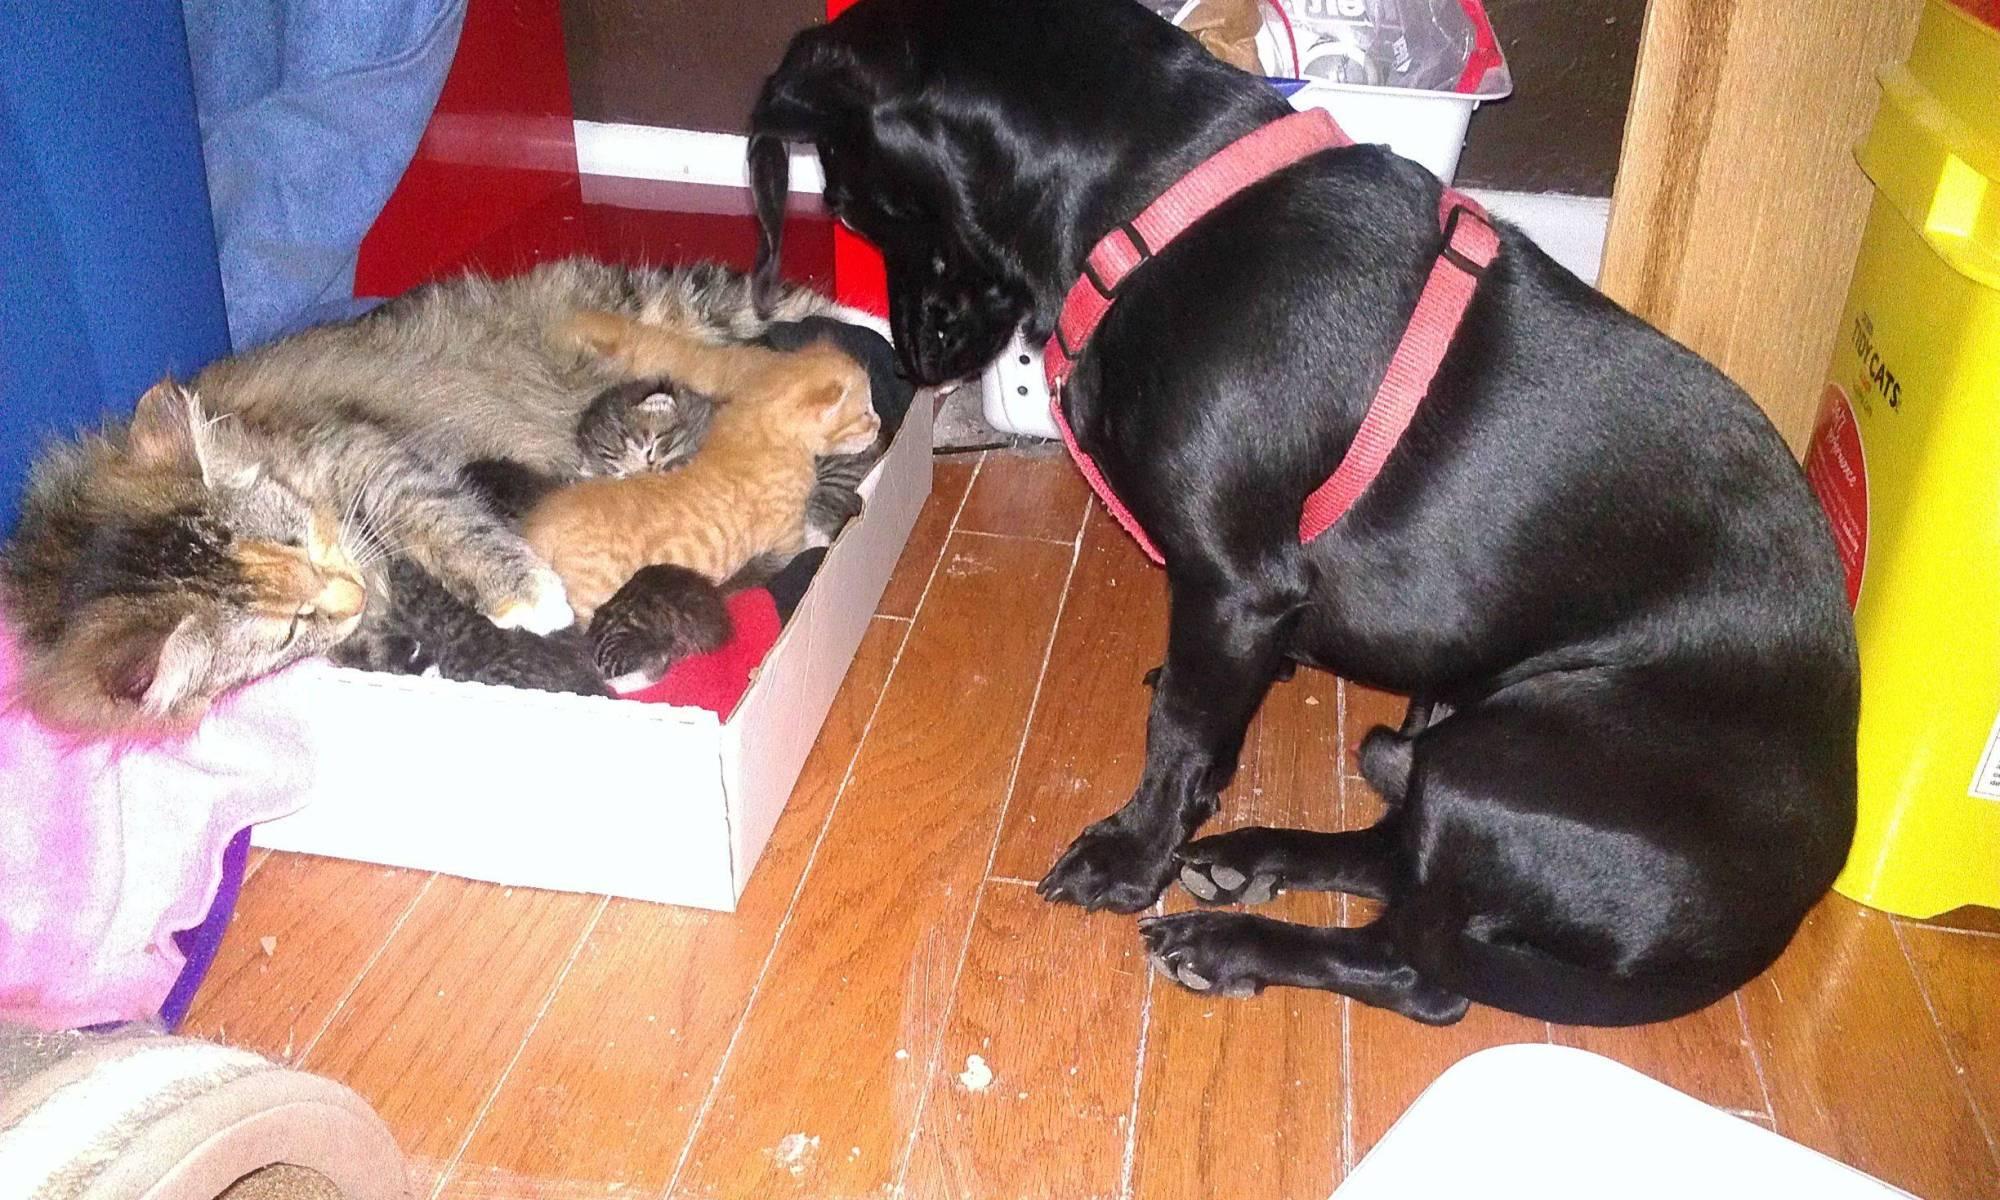 A Canine Helped a Feline Raise Her Kittens